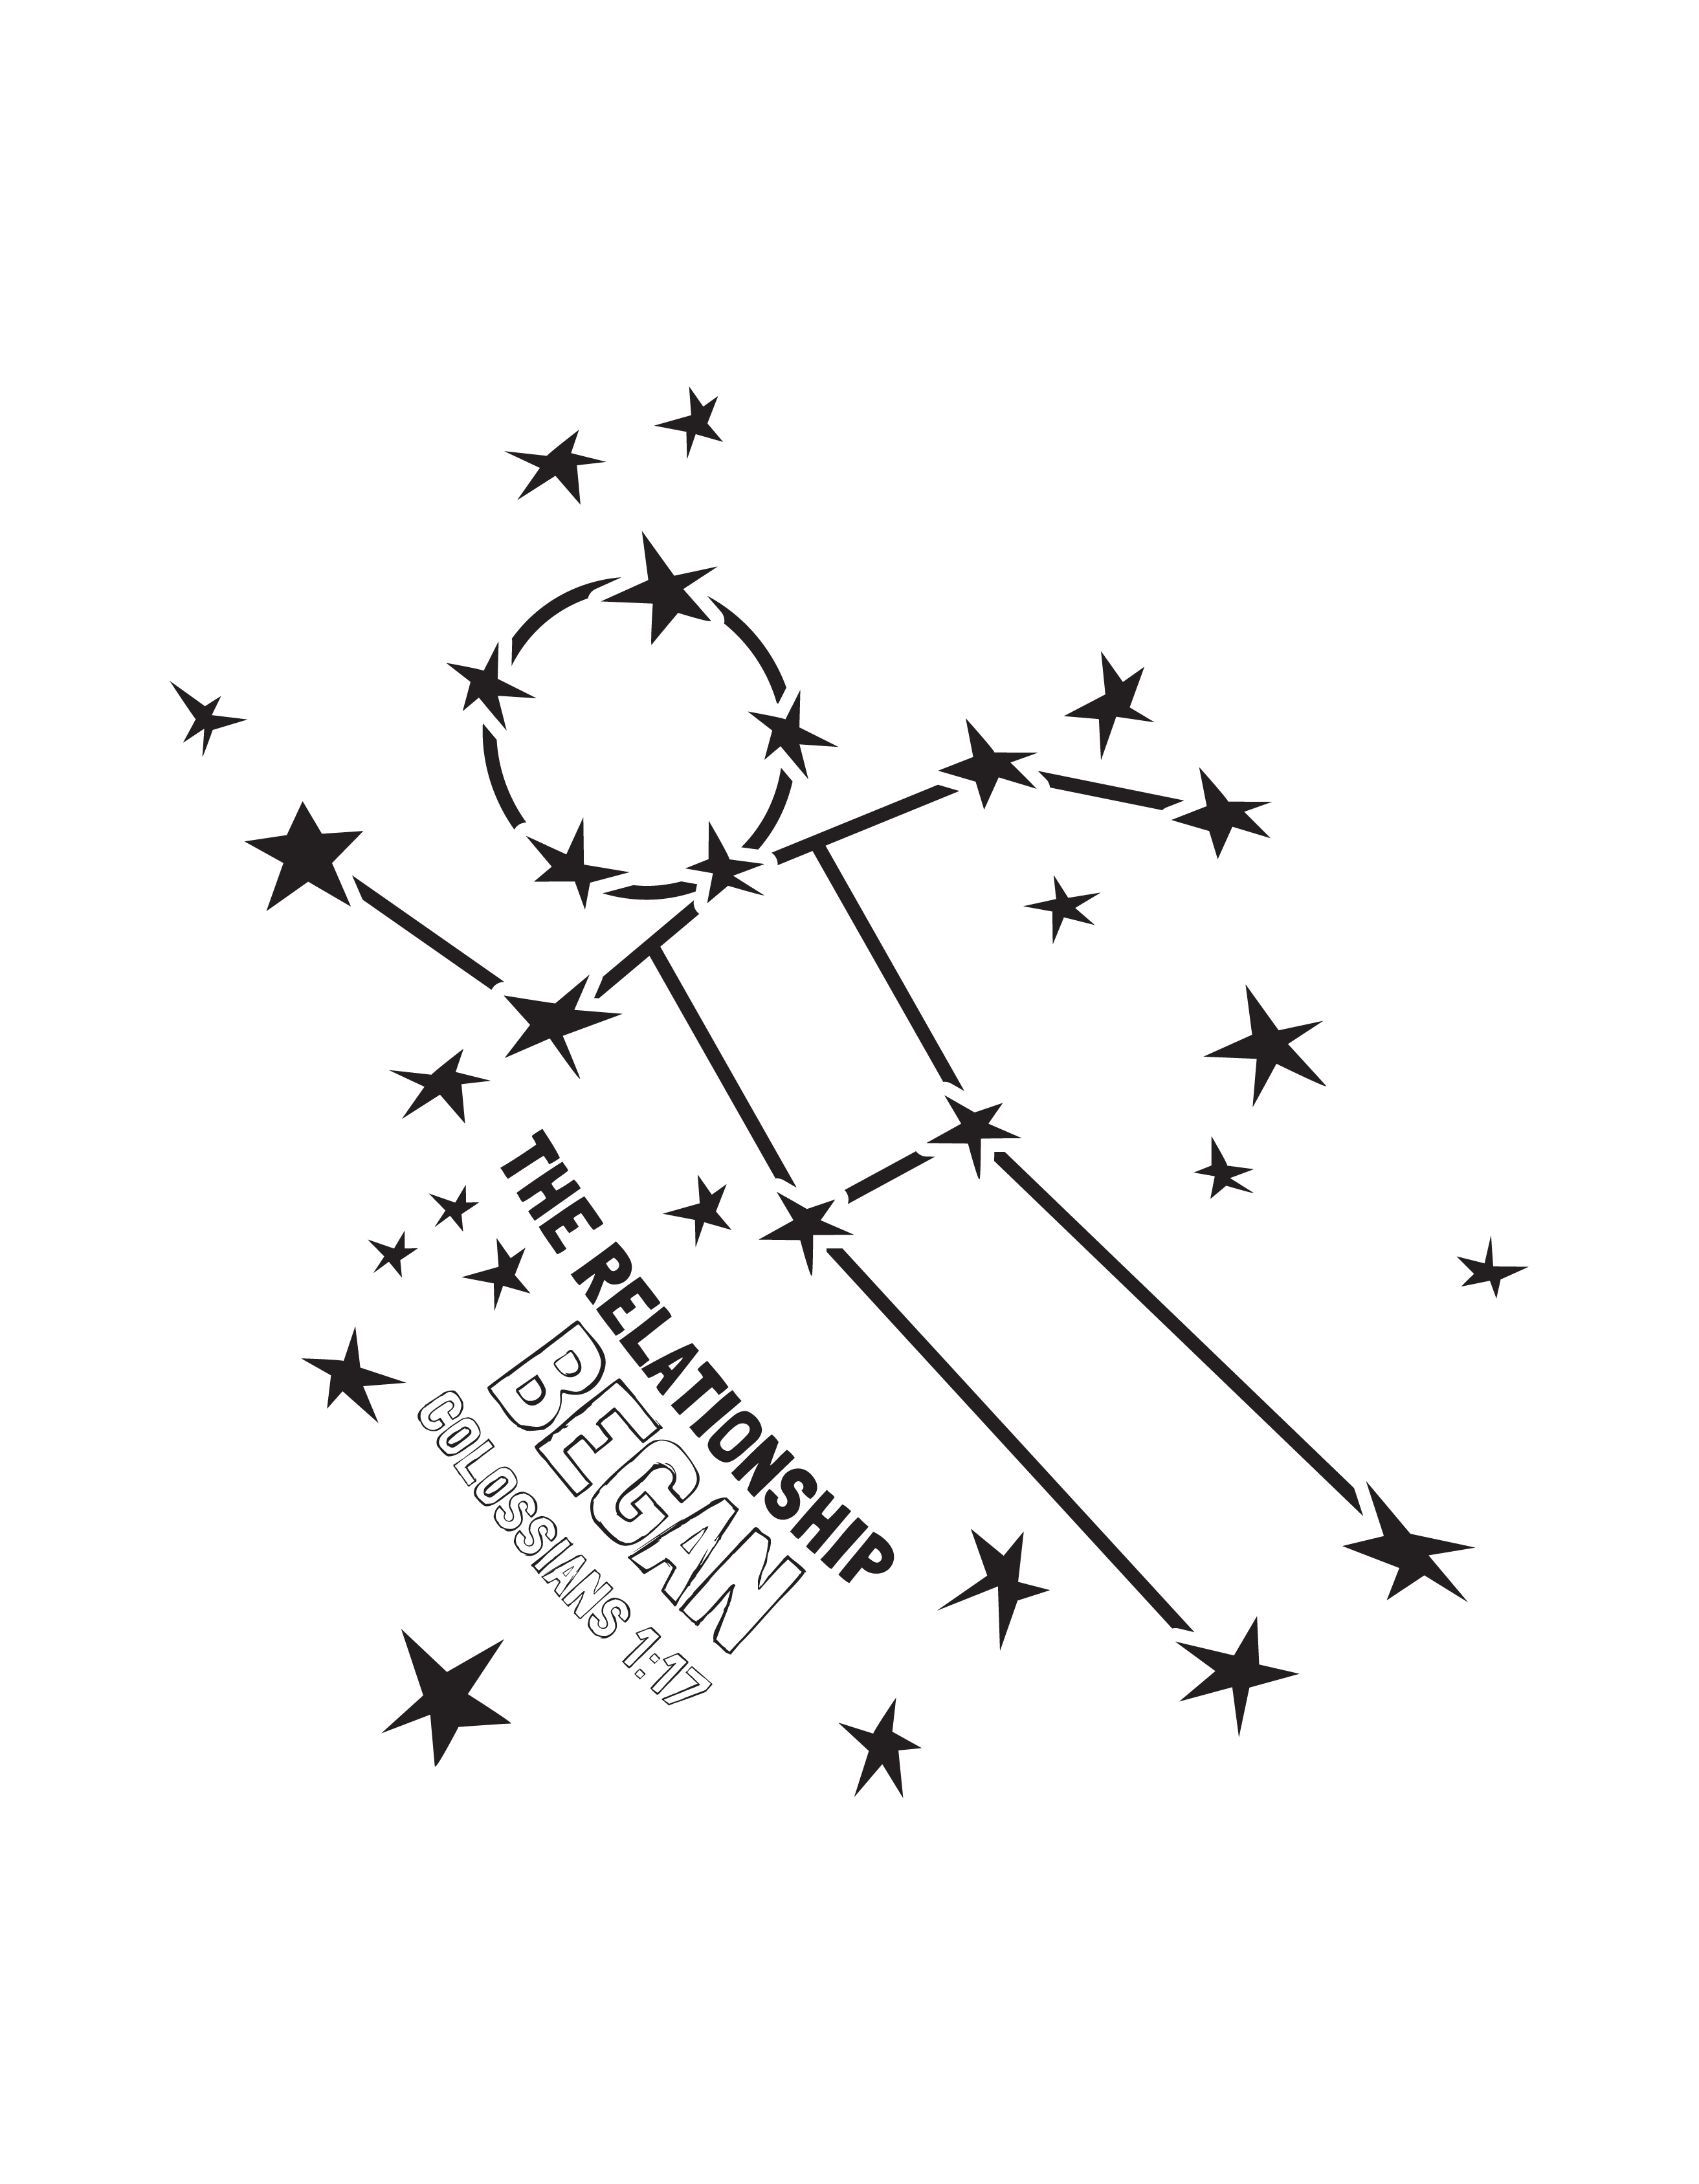 Star constellation clipart transparent download s3-us-west-1.amazonaws.com vbs2016 wp-content uploads 2014 08 ... transparent download